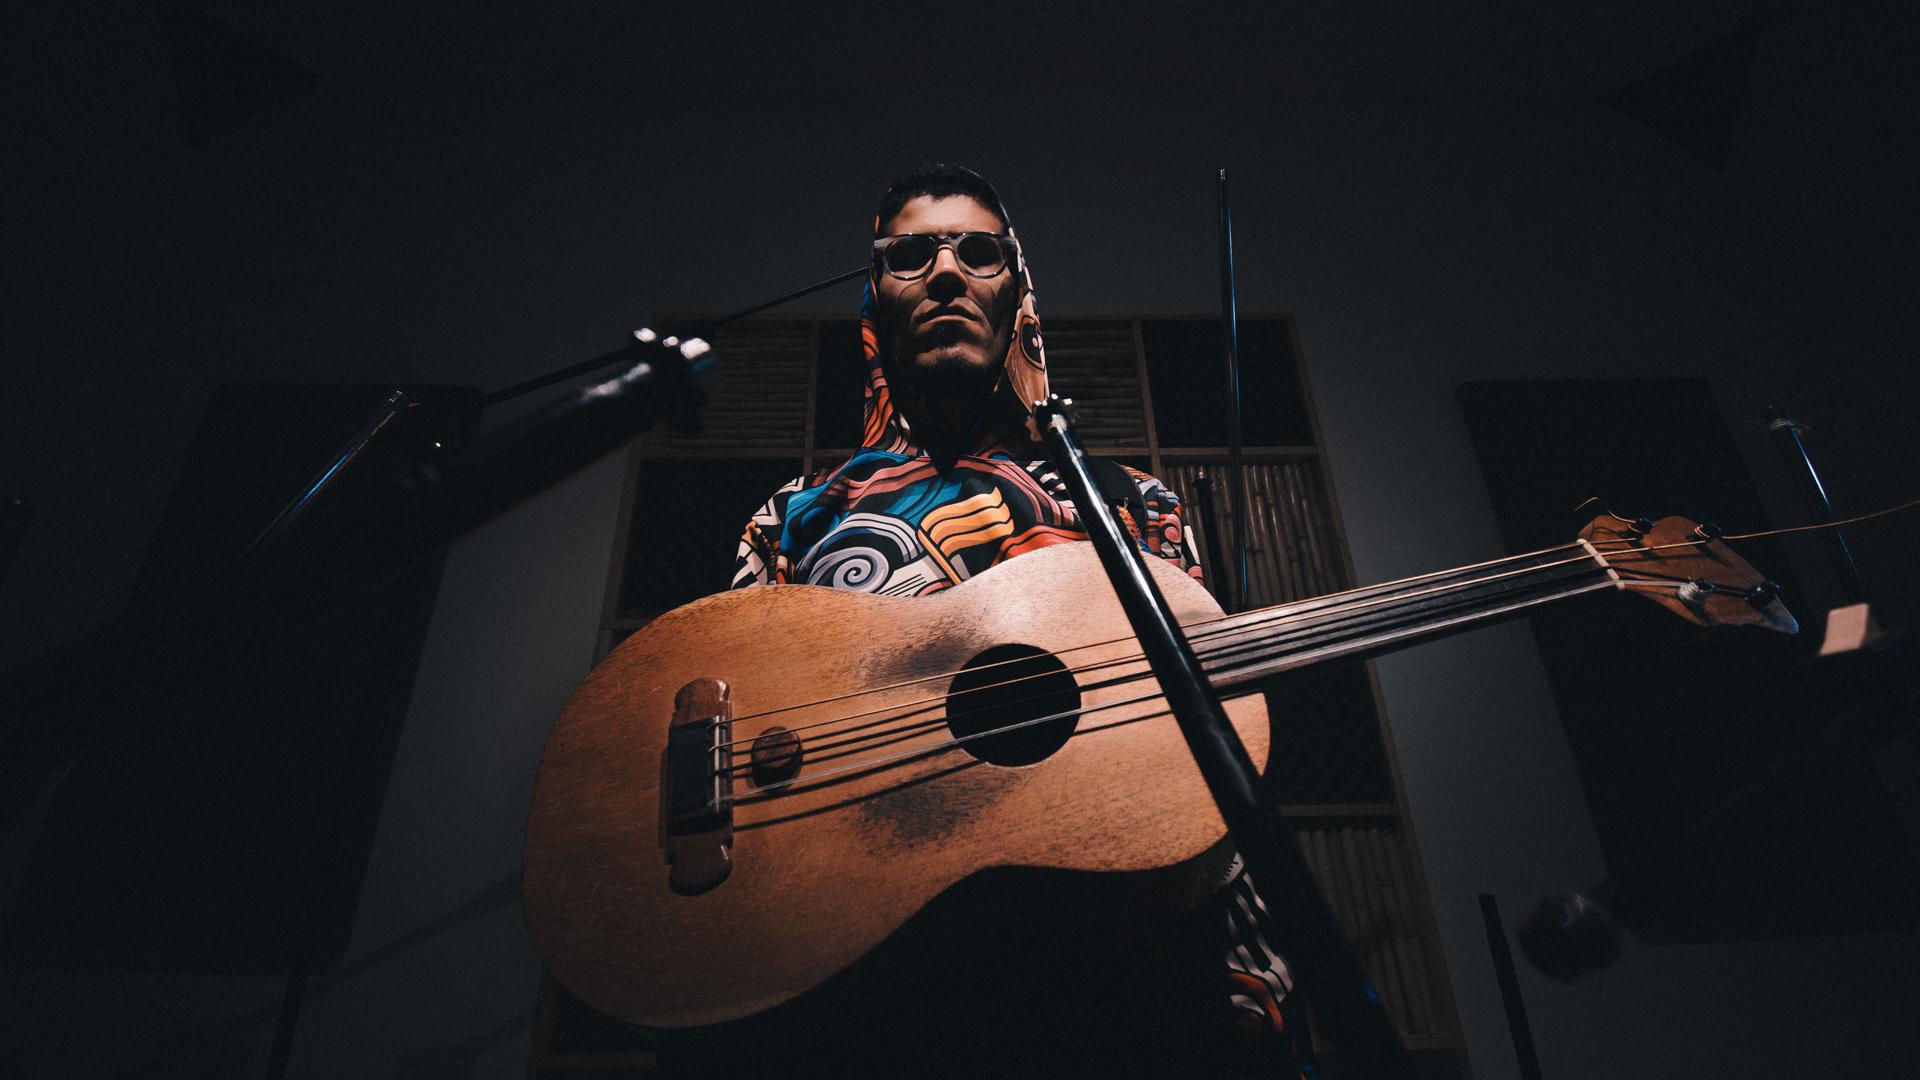 Vico Diaz